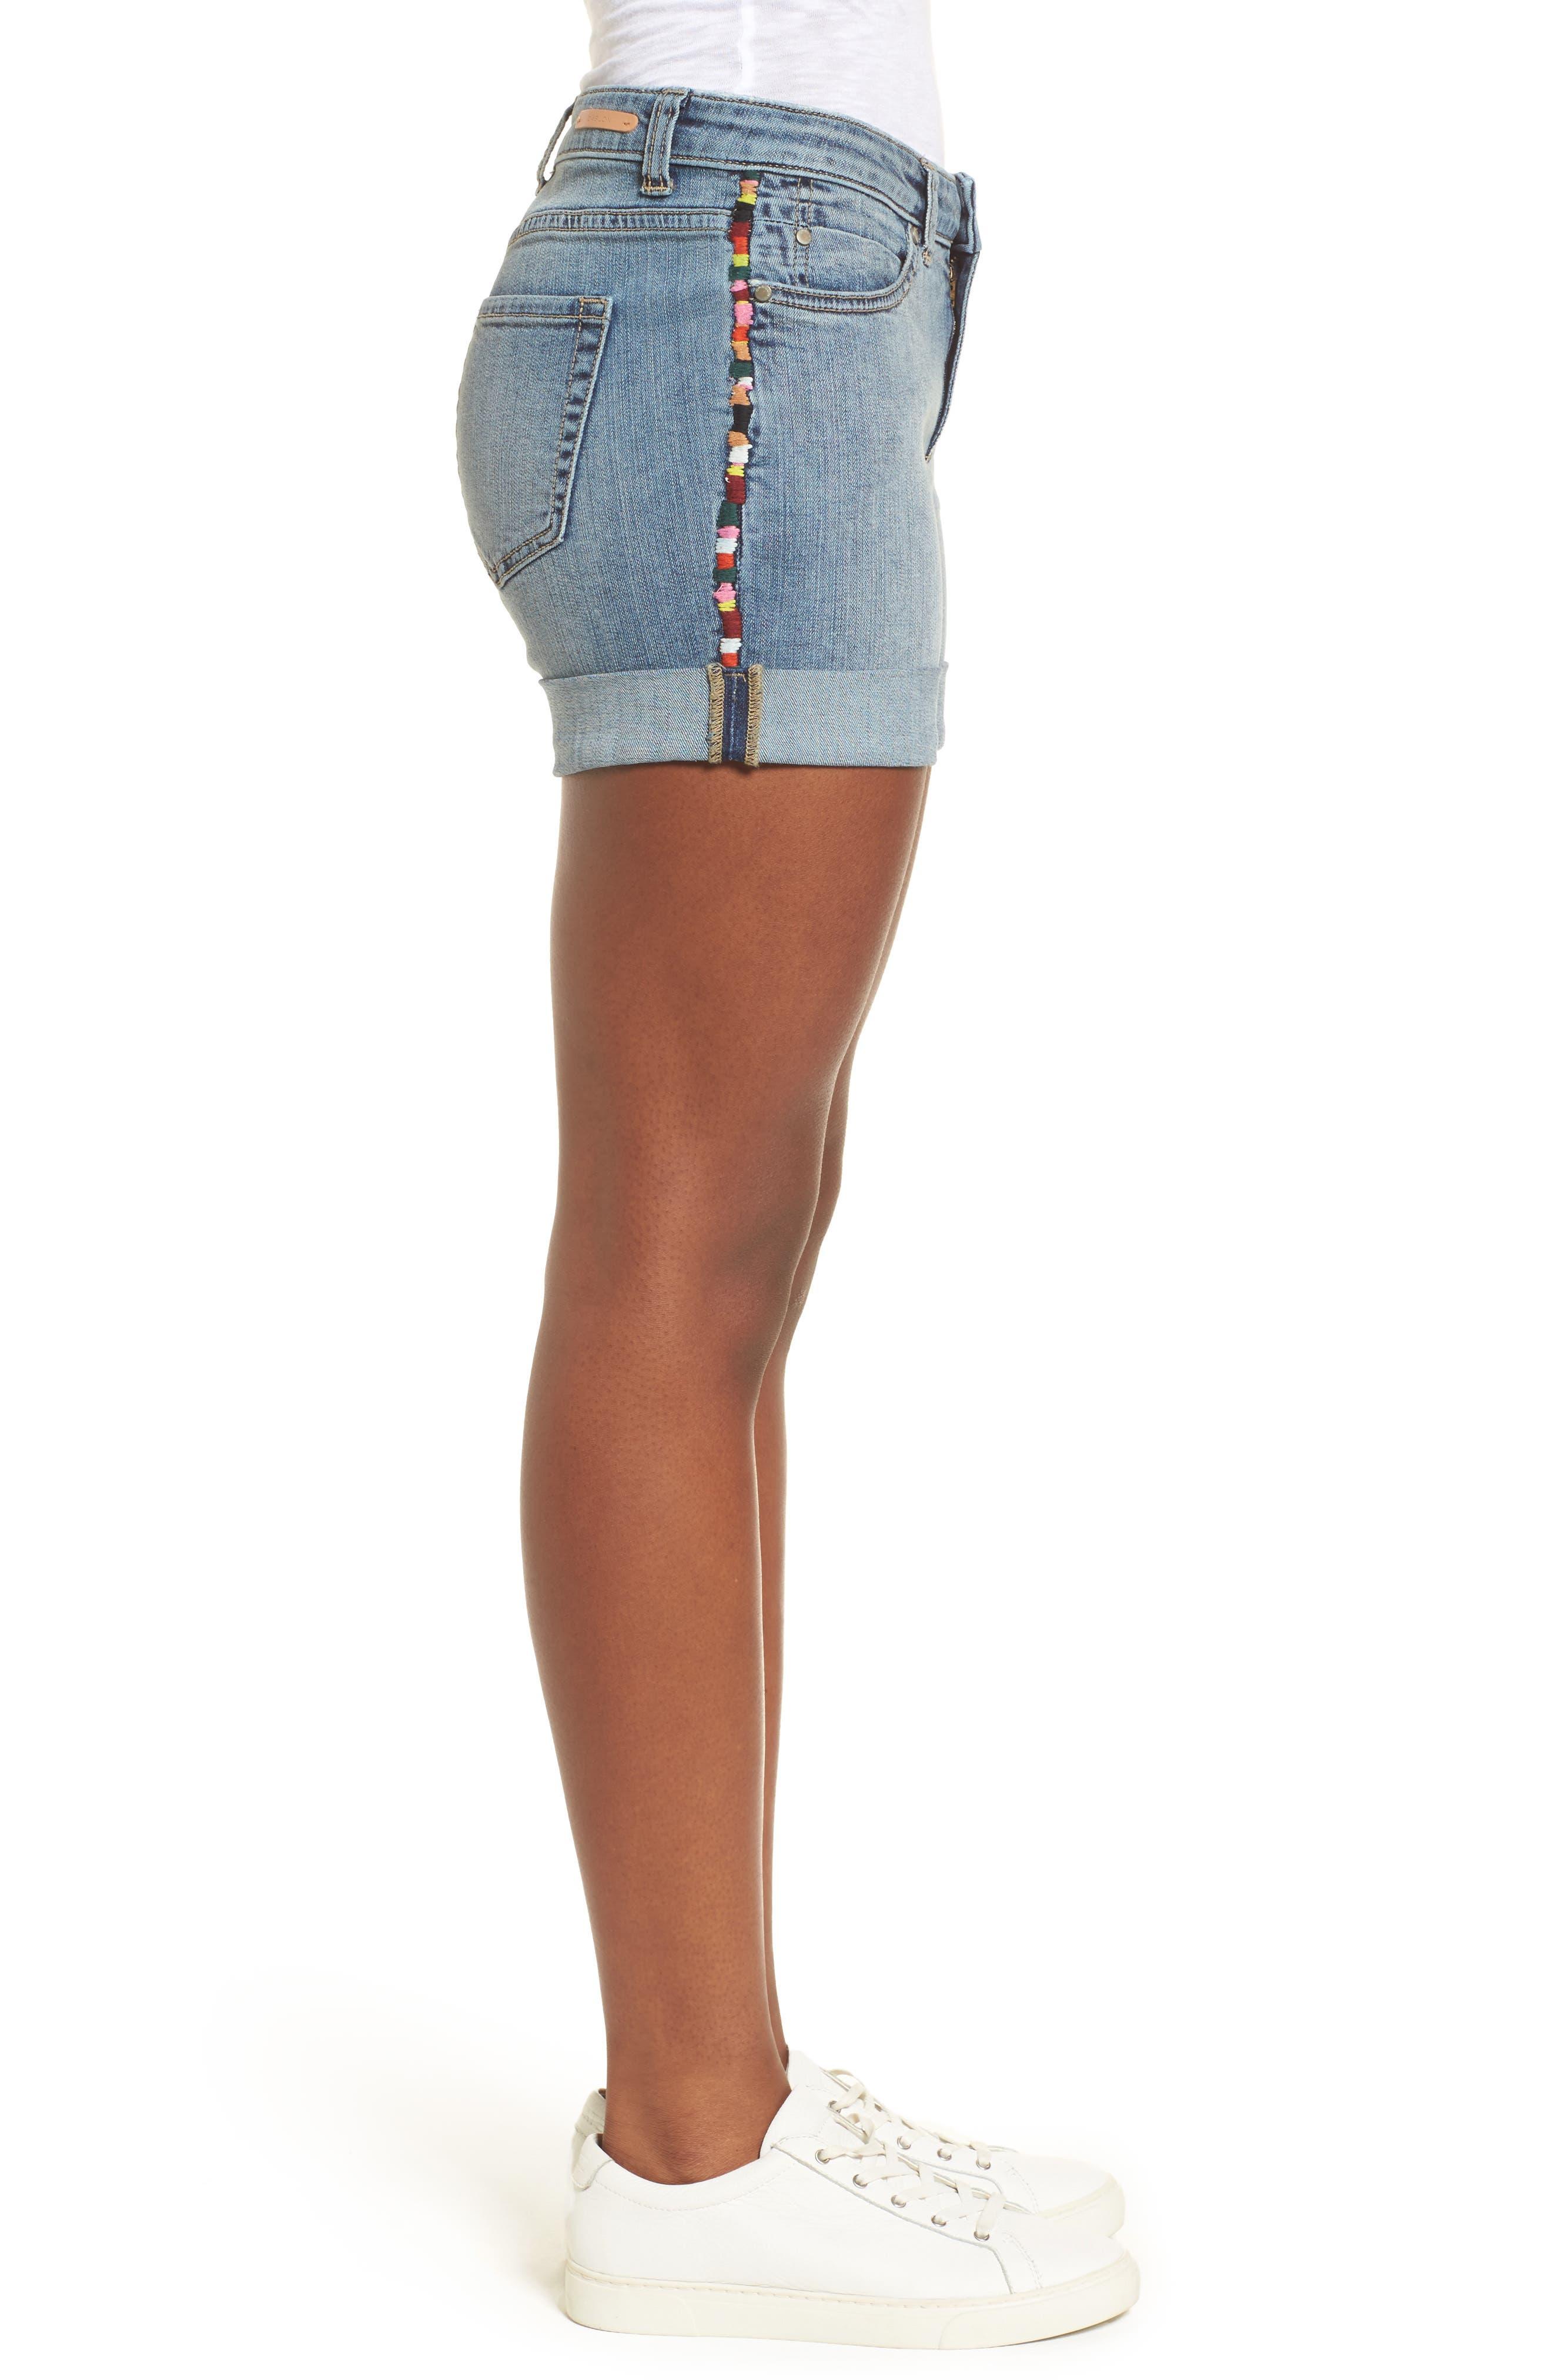 Embroidered Seam Boyfriend Denim Shorts,                             Alternate thumbnail 3, color,                             Sunspot Wash